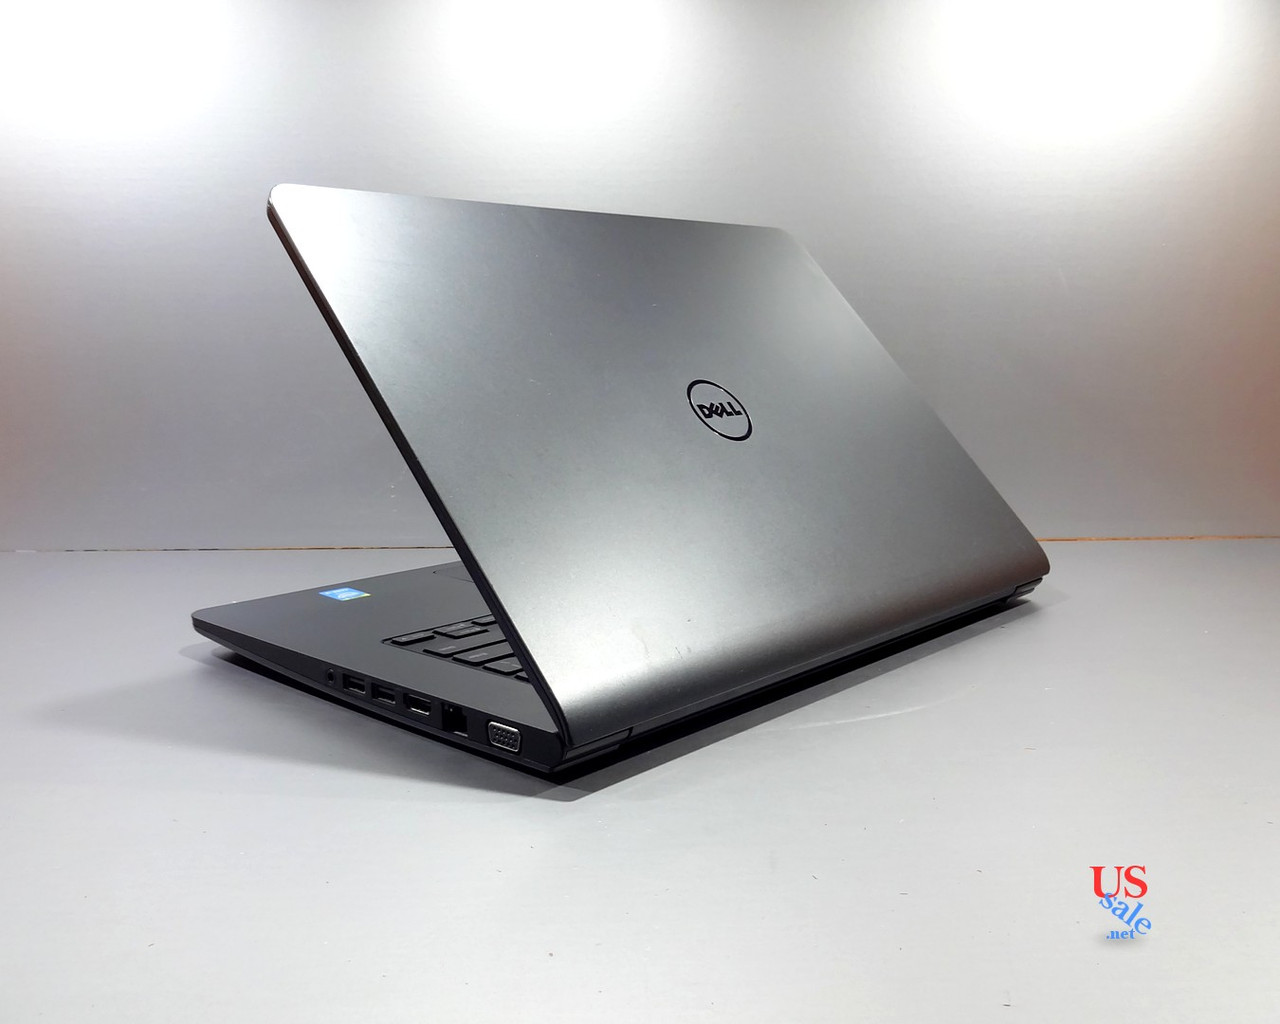 "Ноутбук Dell Latitude 3450 14"", Intel Core i3-5005u 2Ghz, DDR3 8Gb, 1Tb. Гарантія!"